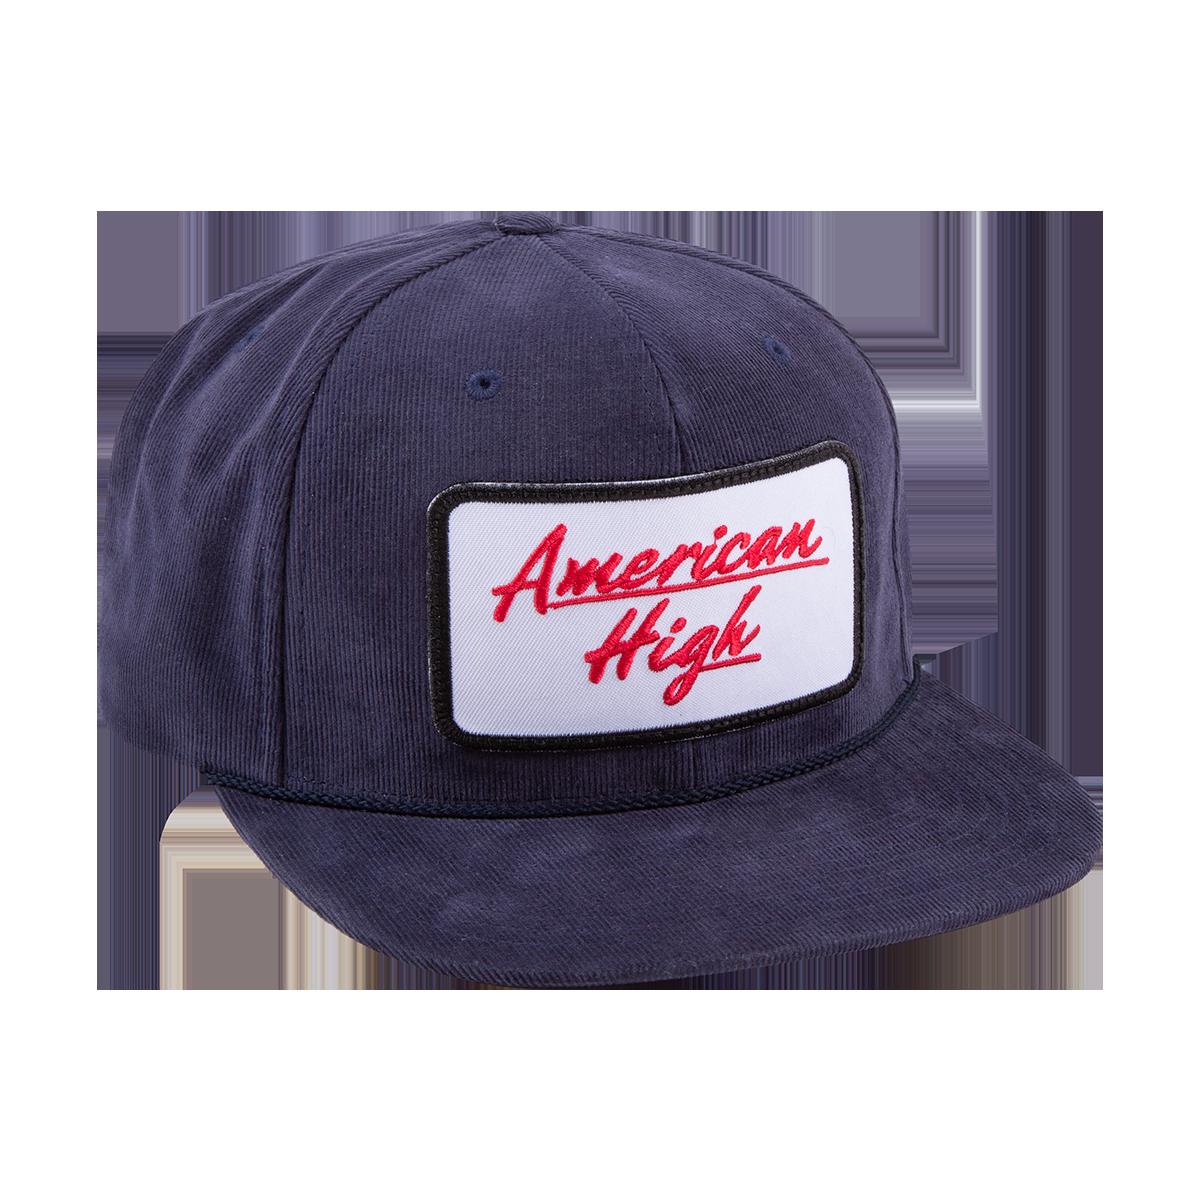 American High Hat